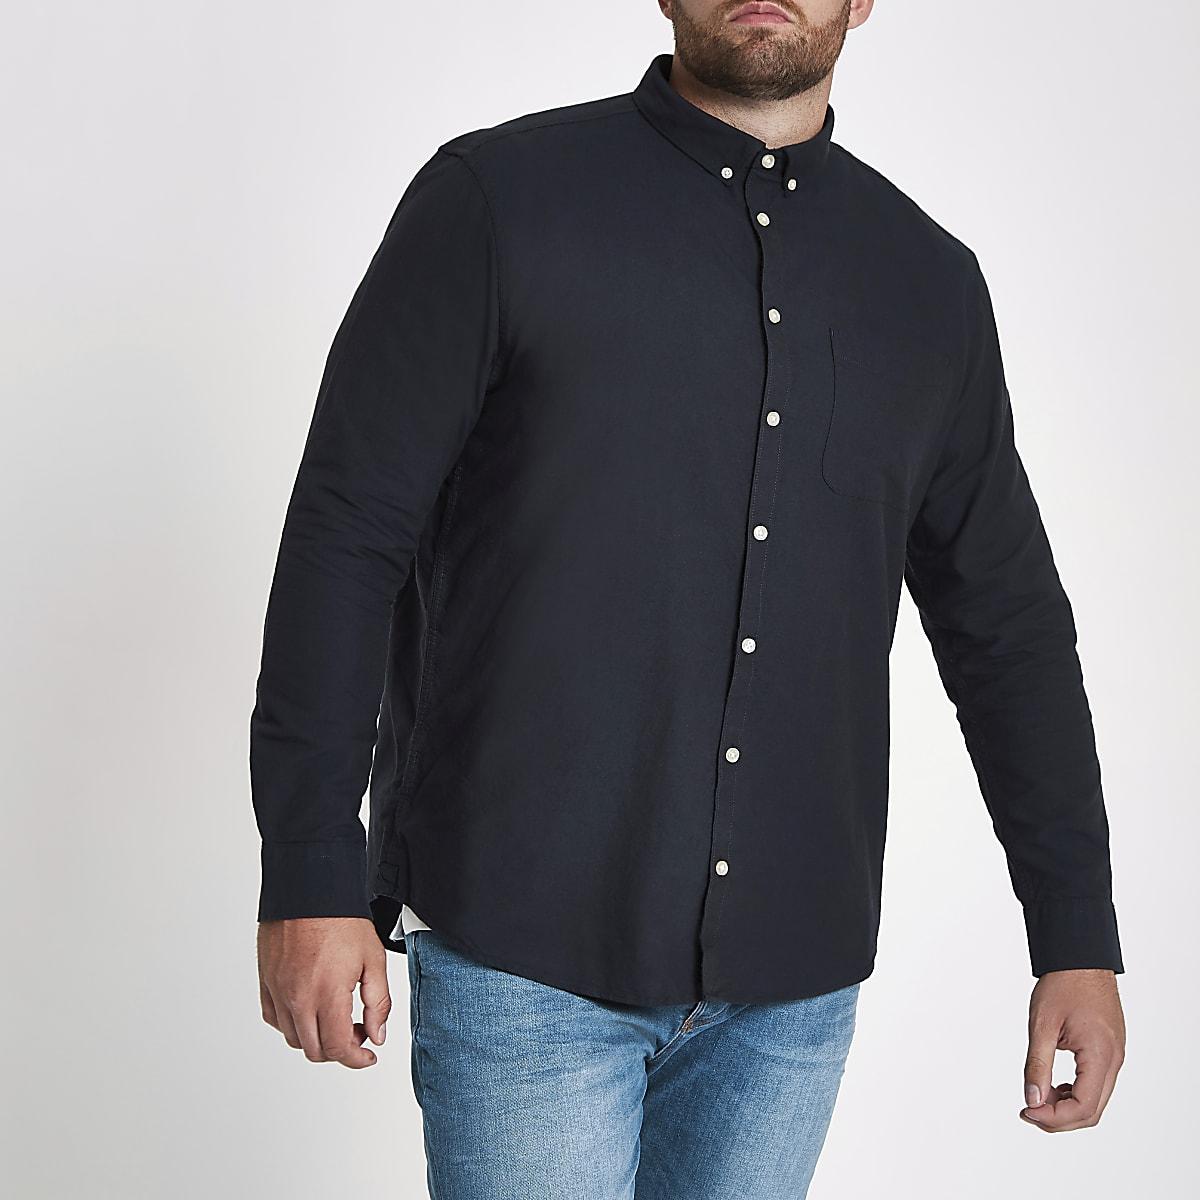 Big and Tall navy long sleeve Oxford shirt